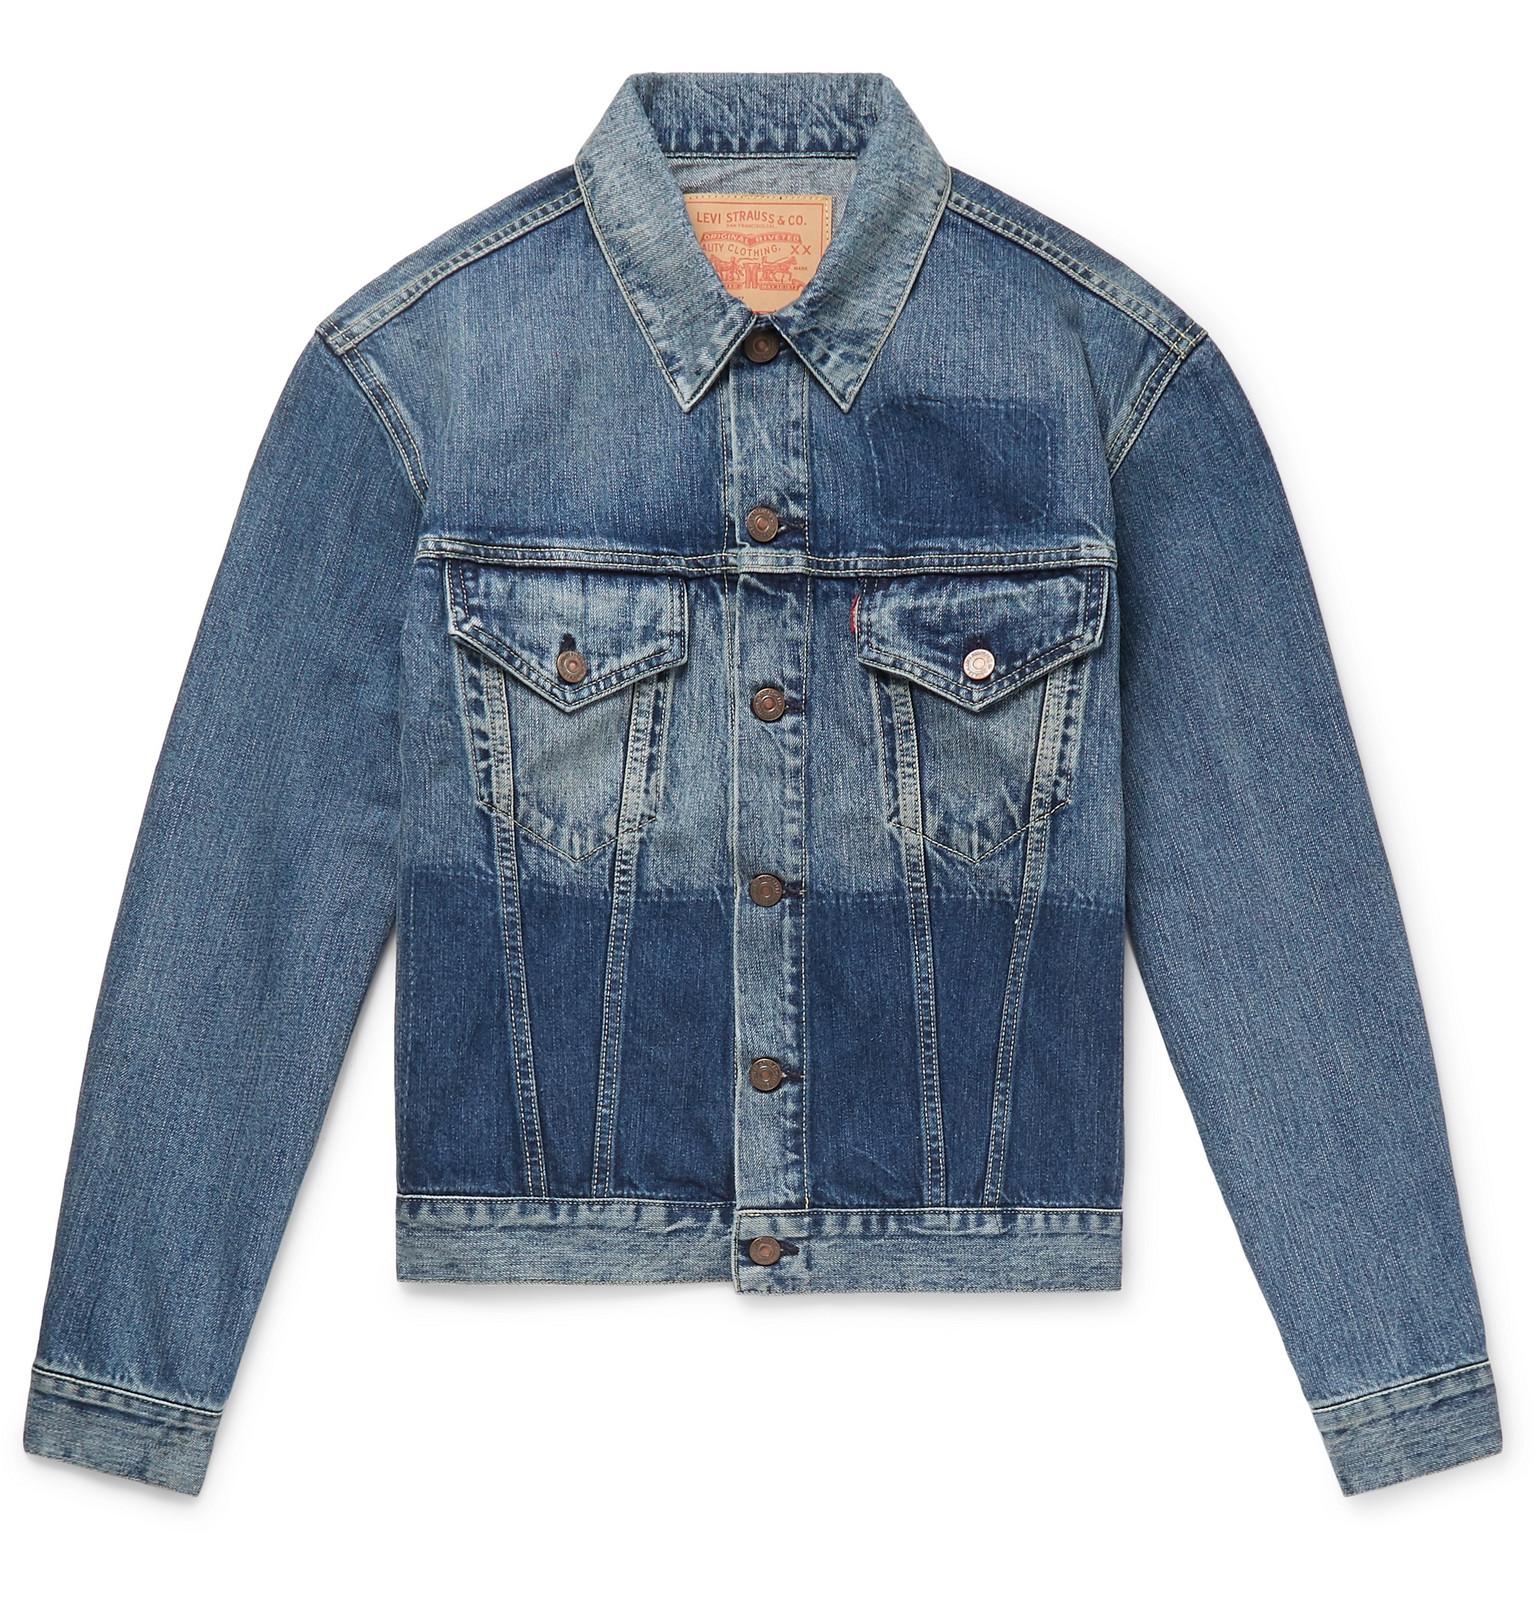 Levis Vintage Clothing 1961 Type Iii 557 Denim Jacket